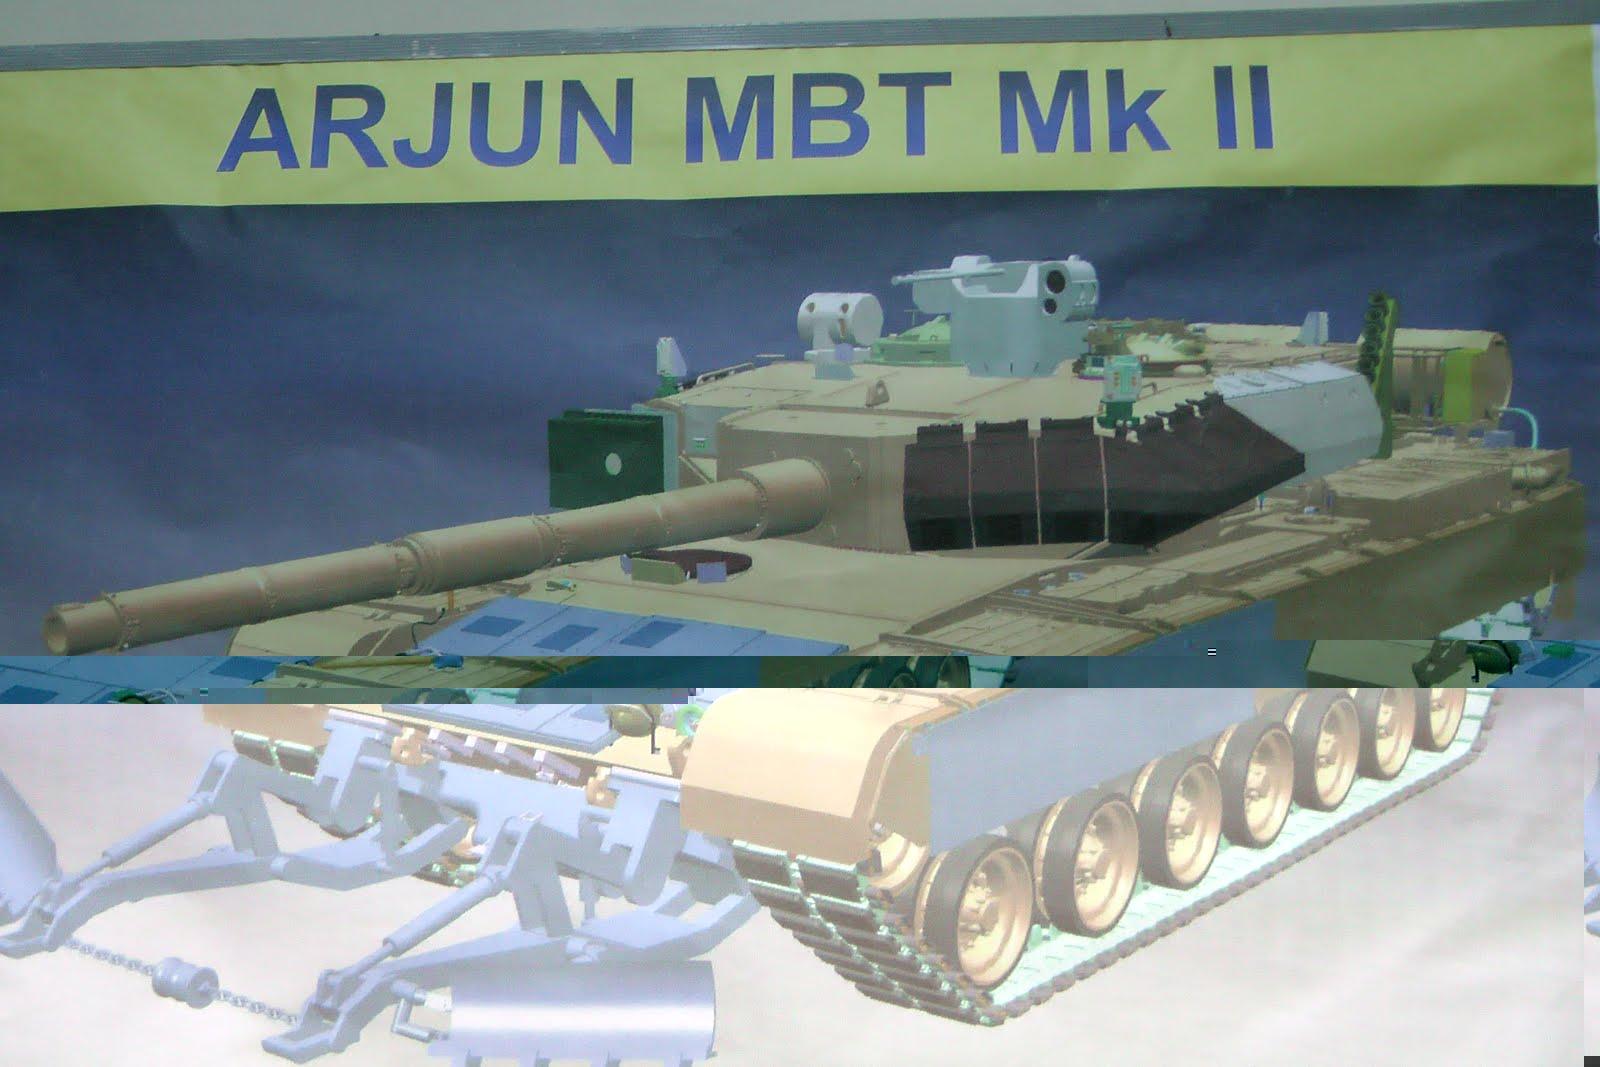 Индийский танк Arjun Mk II. Источник: www.bharat-rakshak.com.